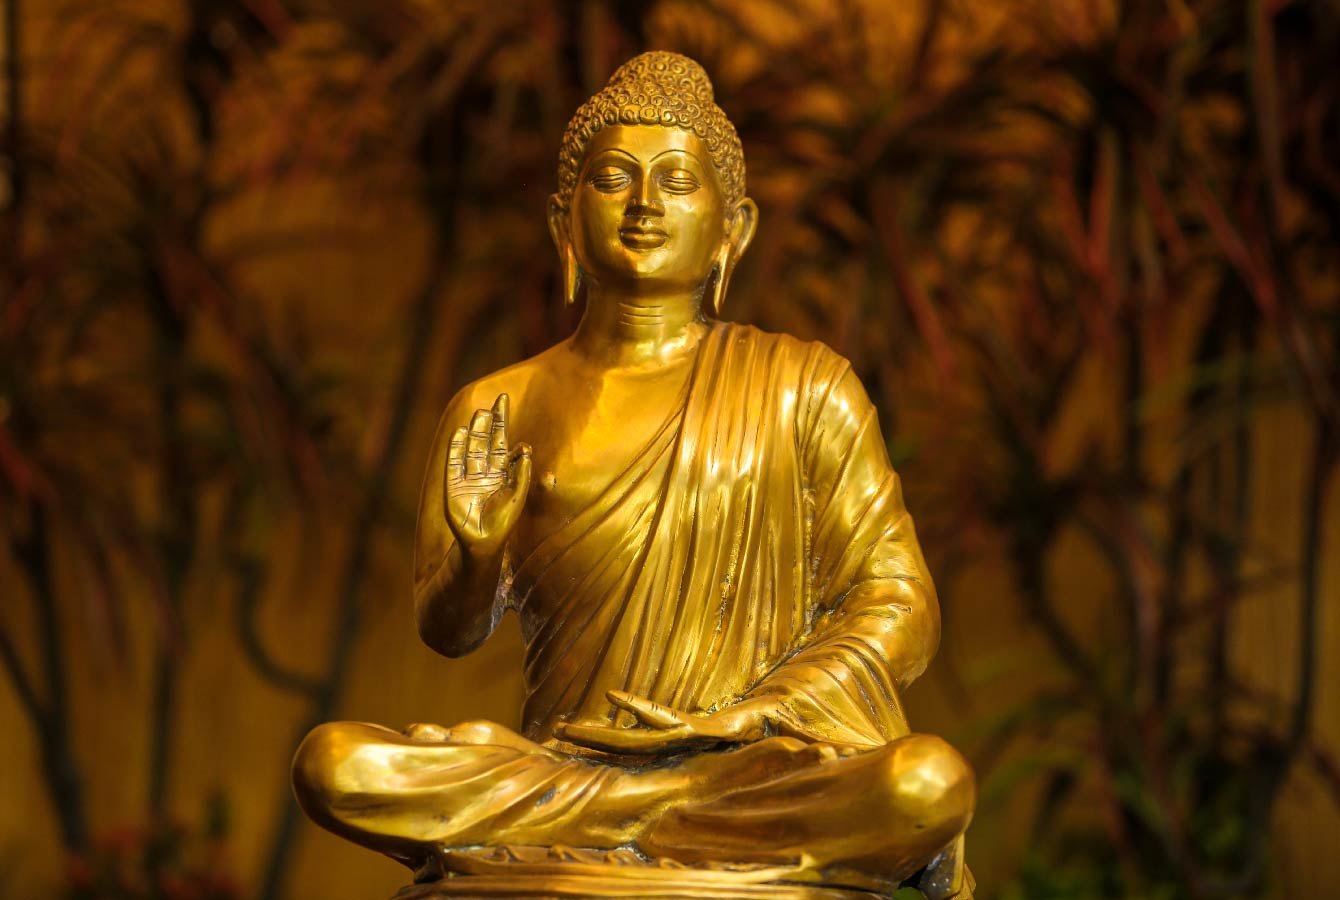 Buddhist Art, School of Art